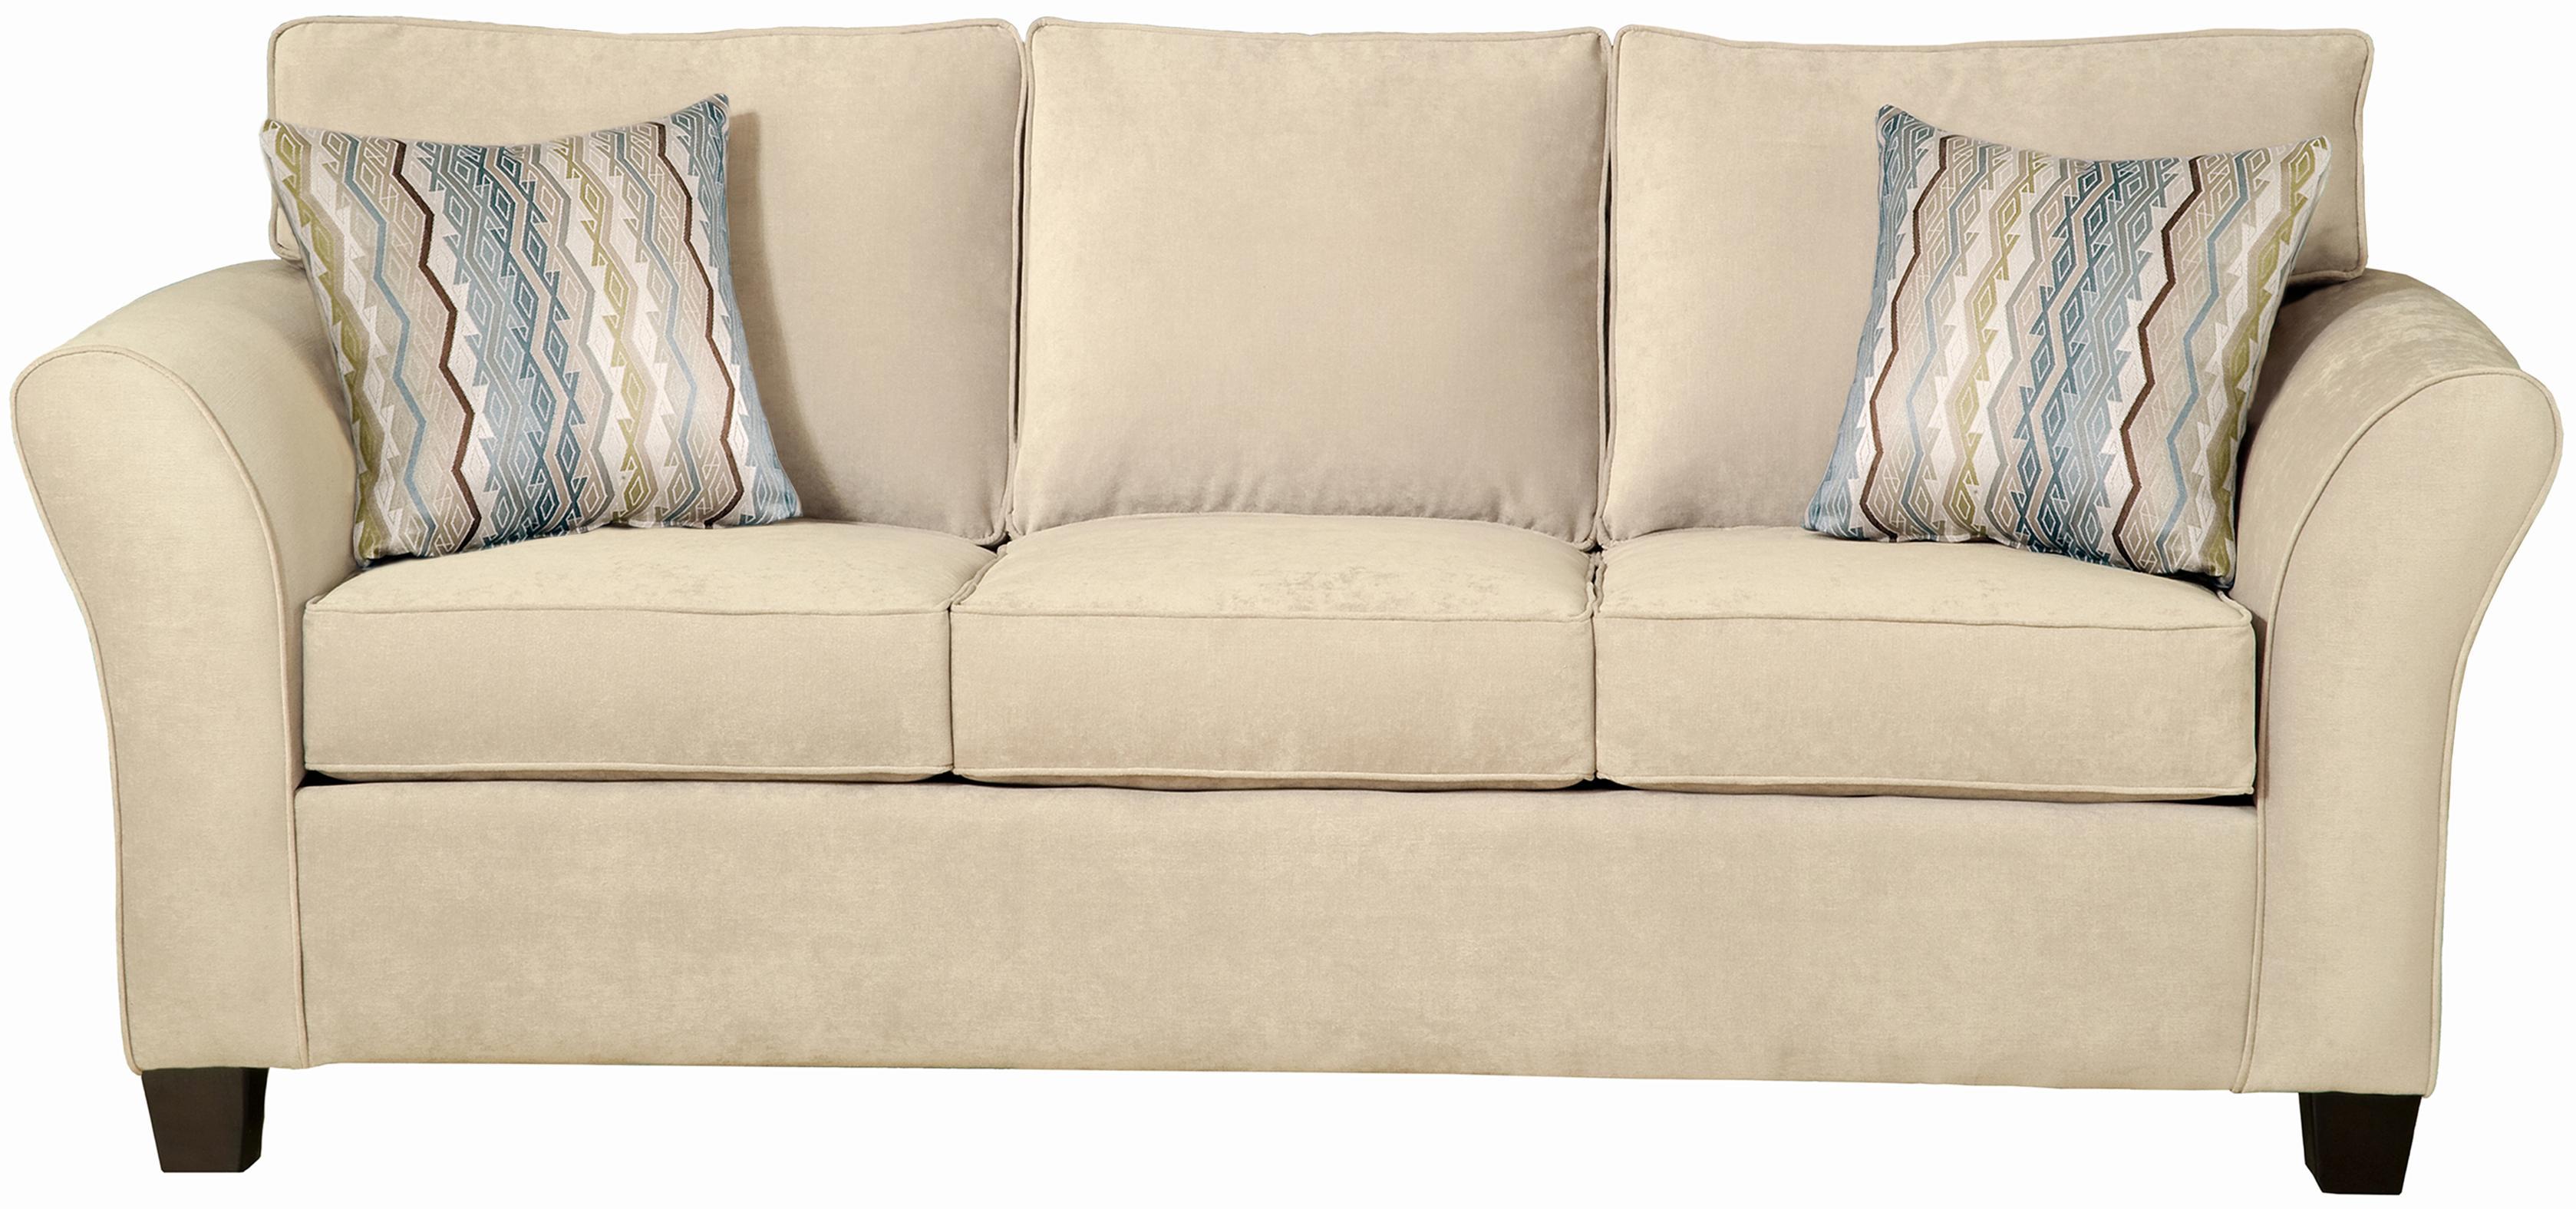 Belfort Essentials Addison Stationary Sofa   Item Number: 8400 30